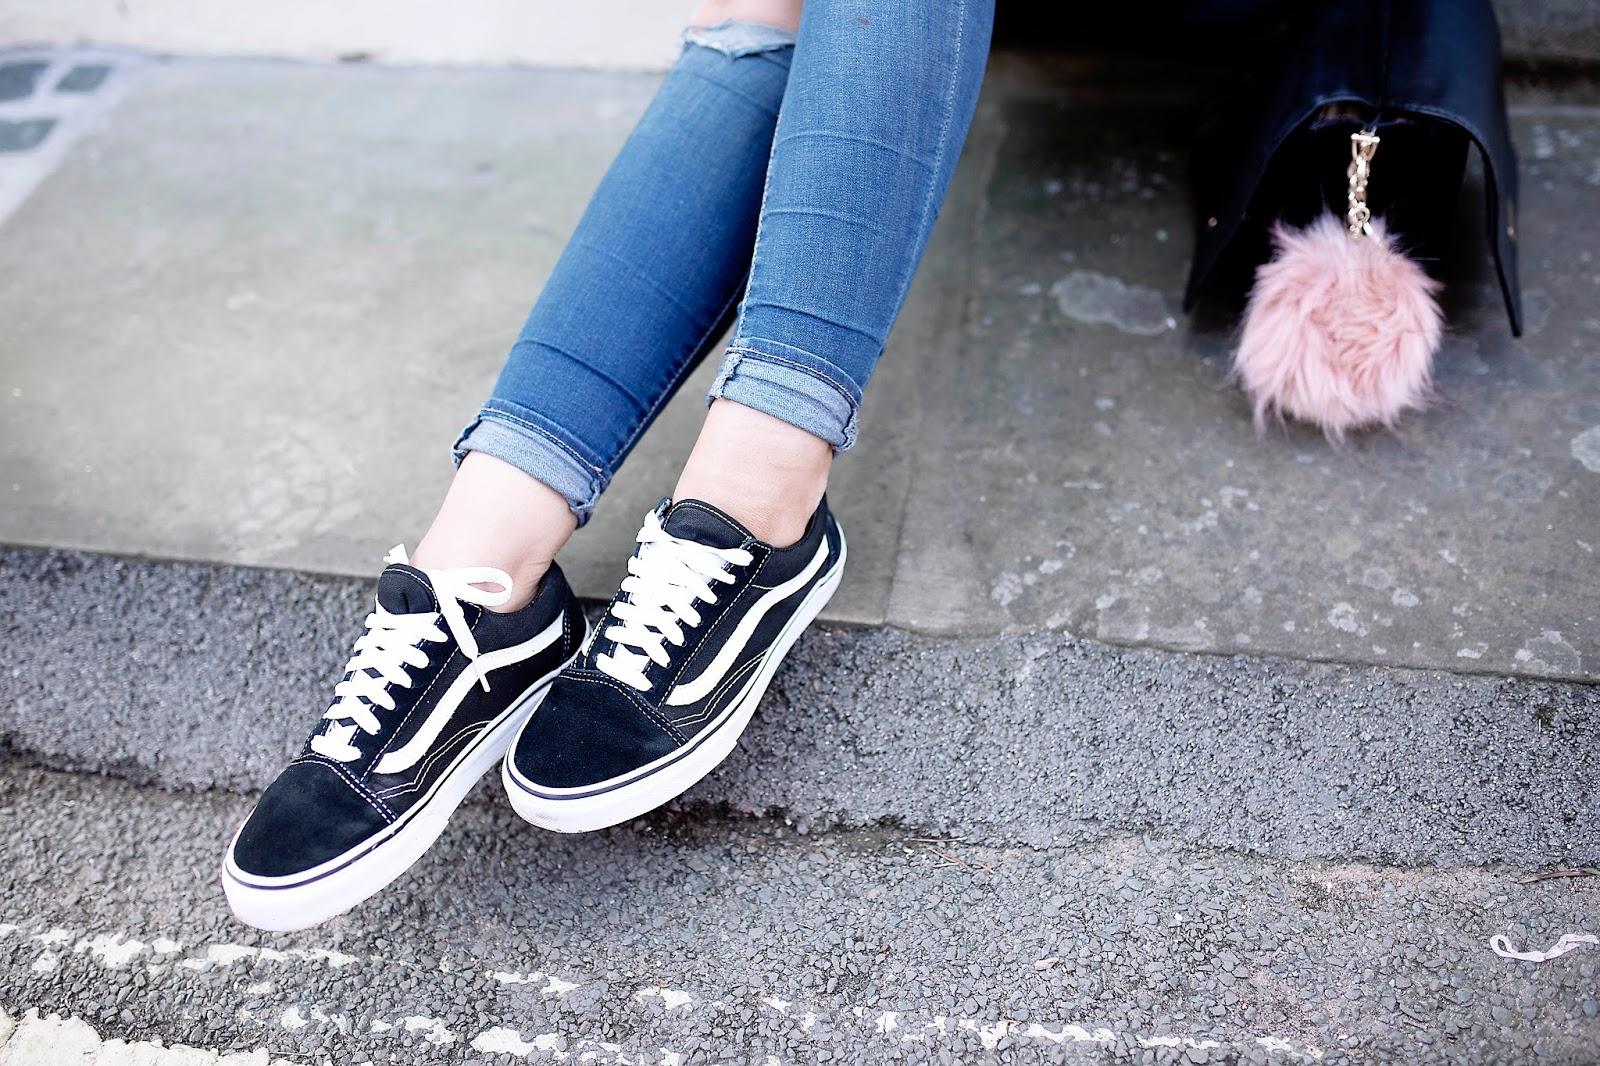 Style, Fashion, Outfit, Primark, High Street, Spring, Spring Fashion, pink suede jacket, pink jacket outfit, ripped jeans, petite fashion, dizzybrunette3 fashion,